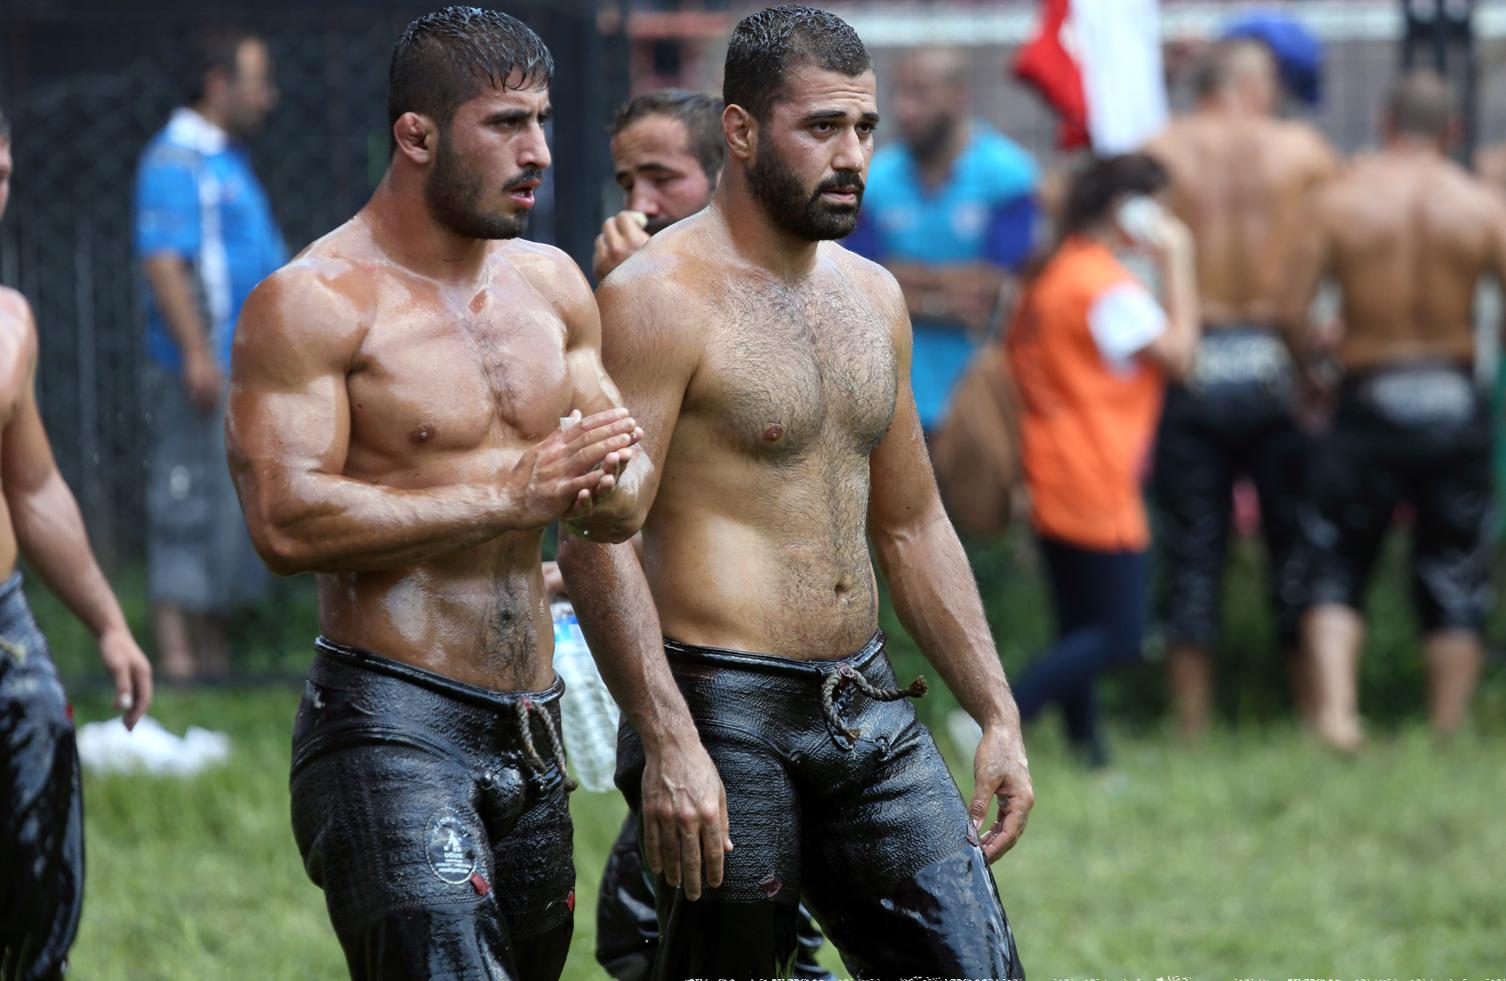 videos gays de lucha turca